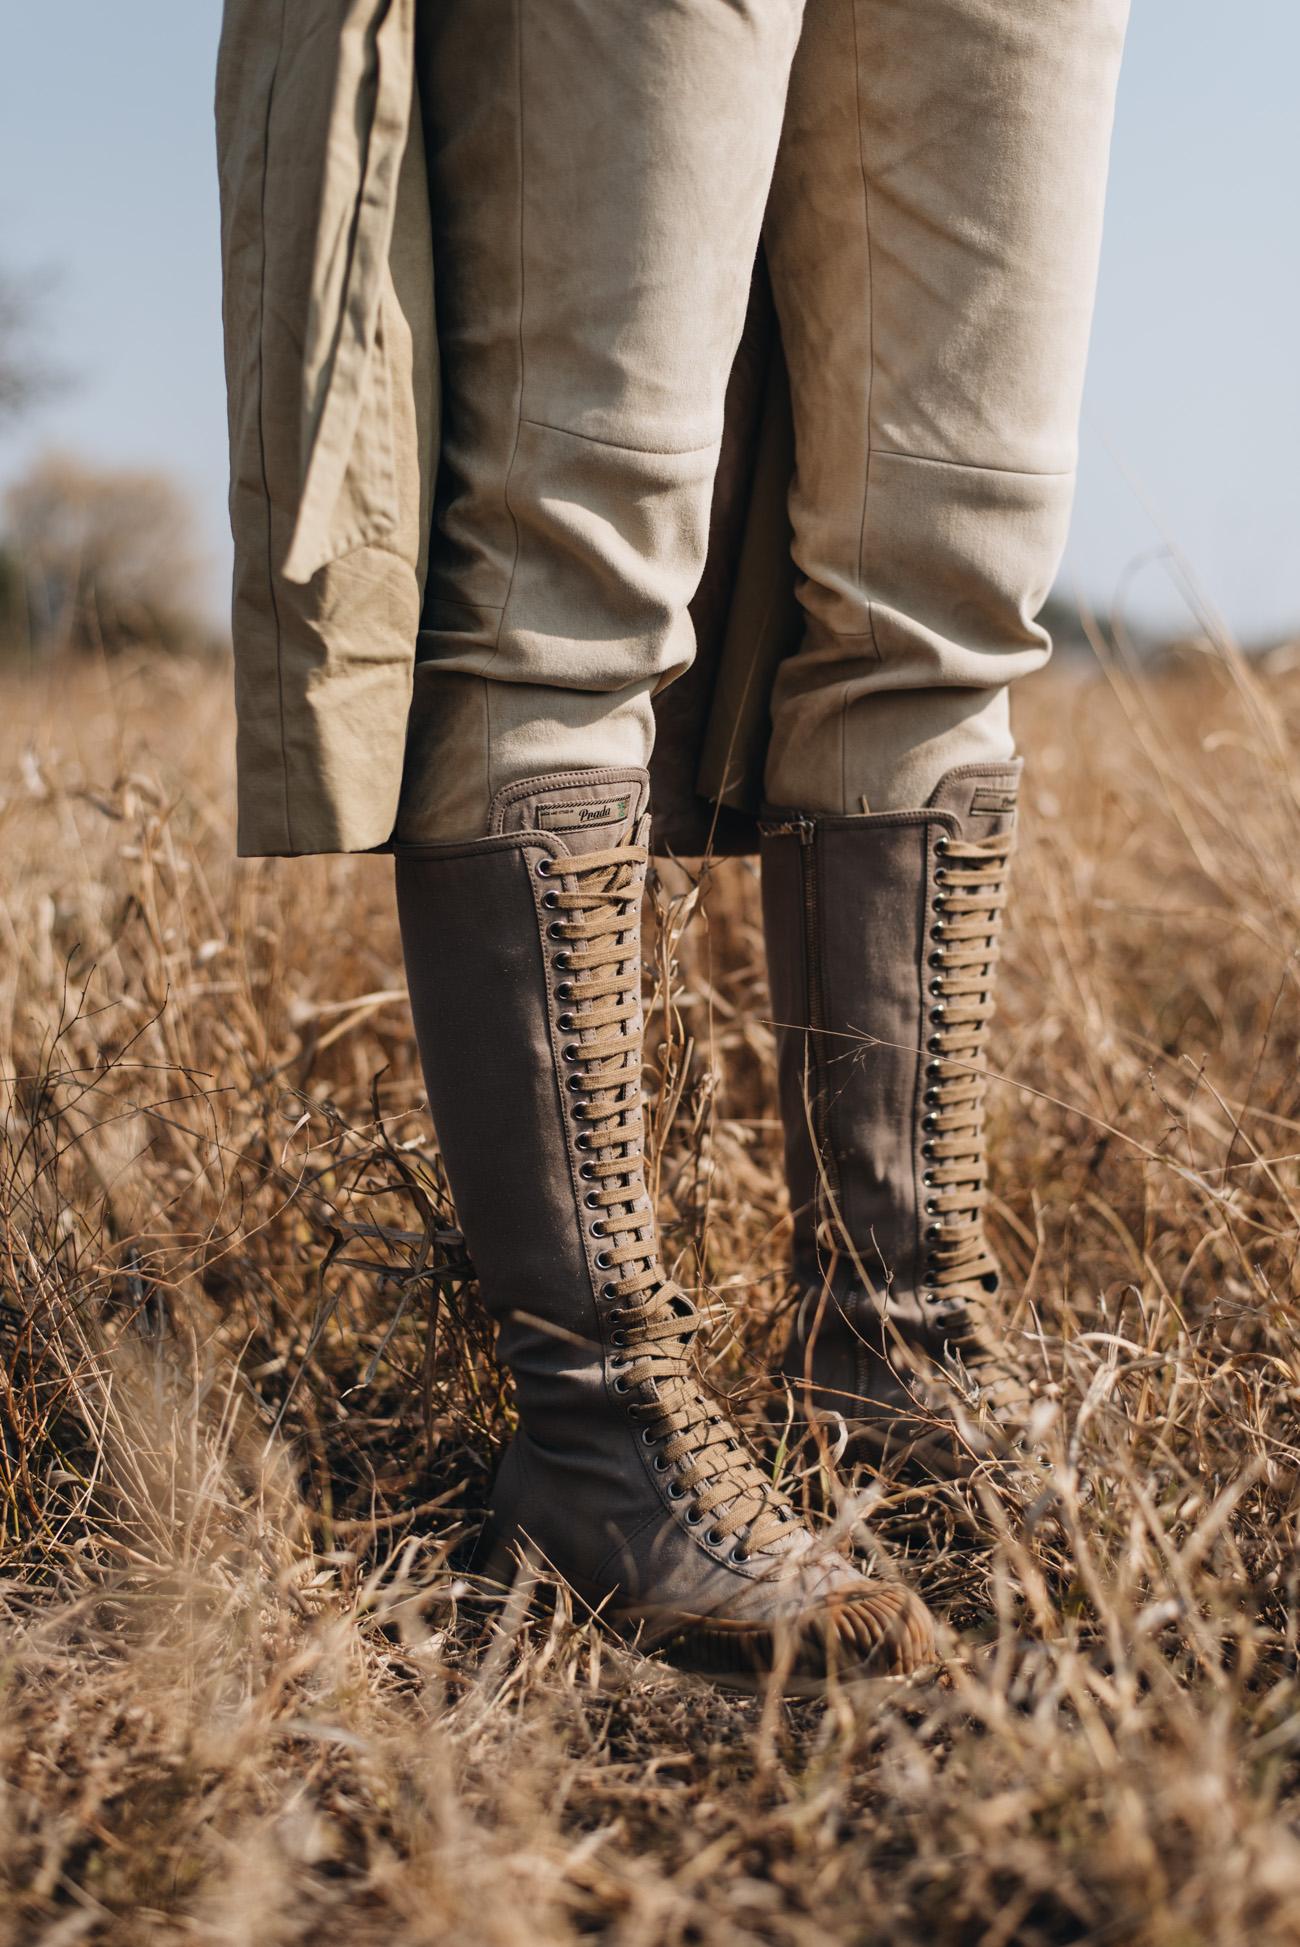 Prada-lace-up-boots-khaki-nina-schwichtenberg-fashiioncarpet